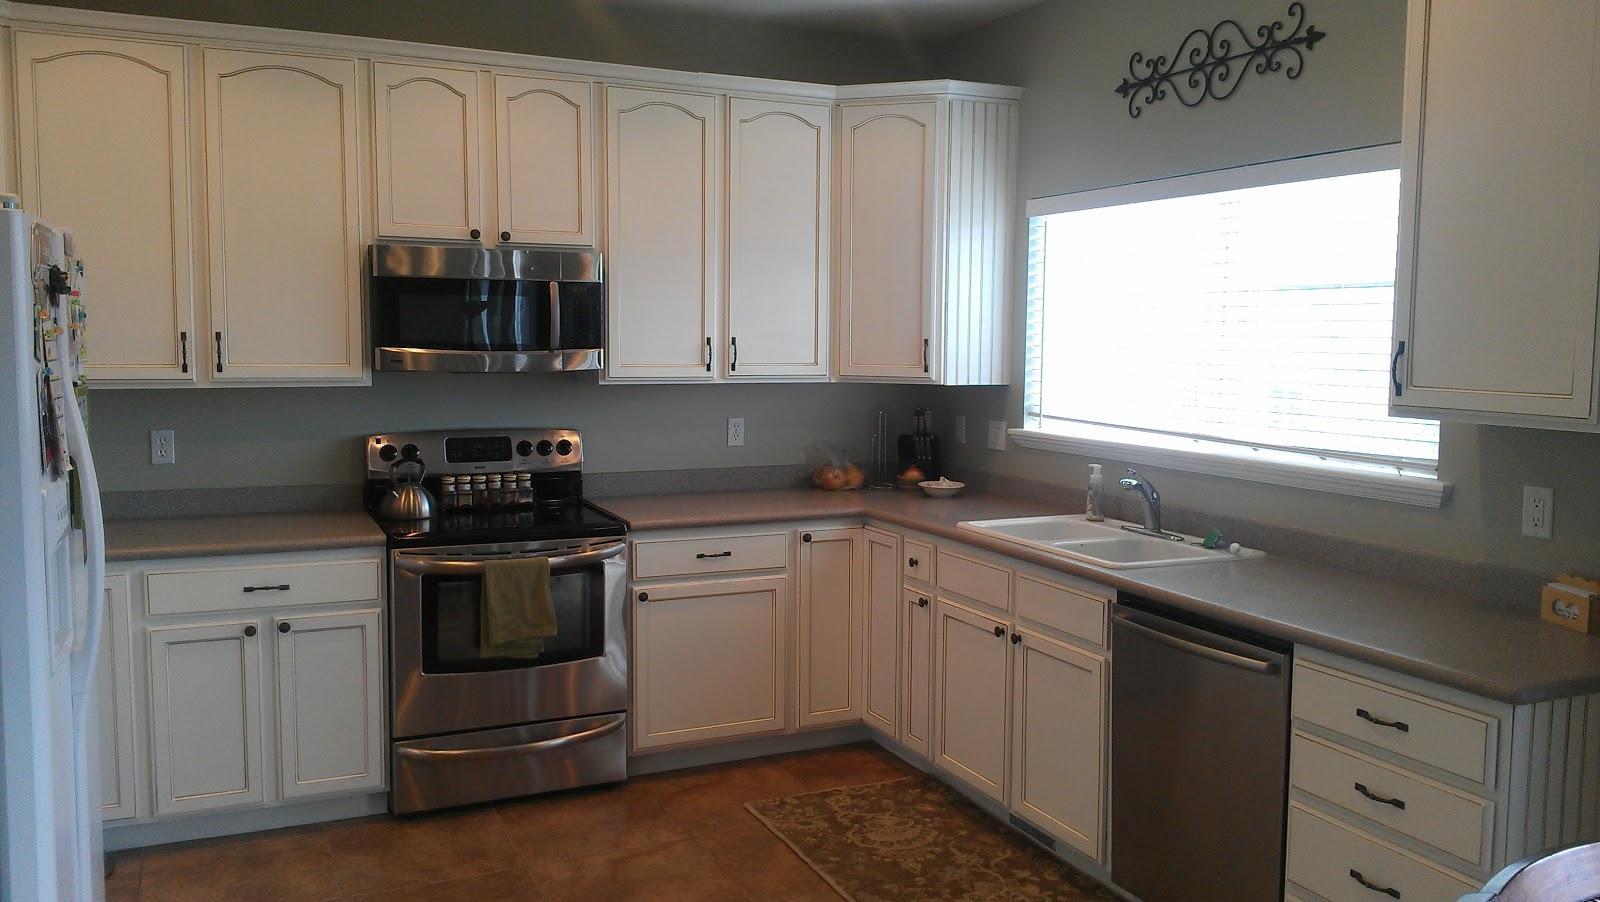 400 And Cloverleaf: Oak Cabinets Go White